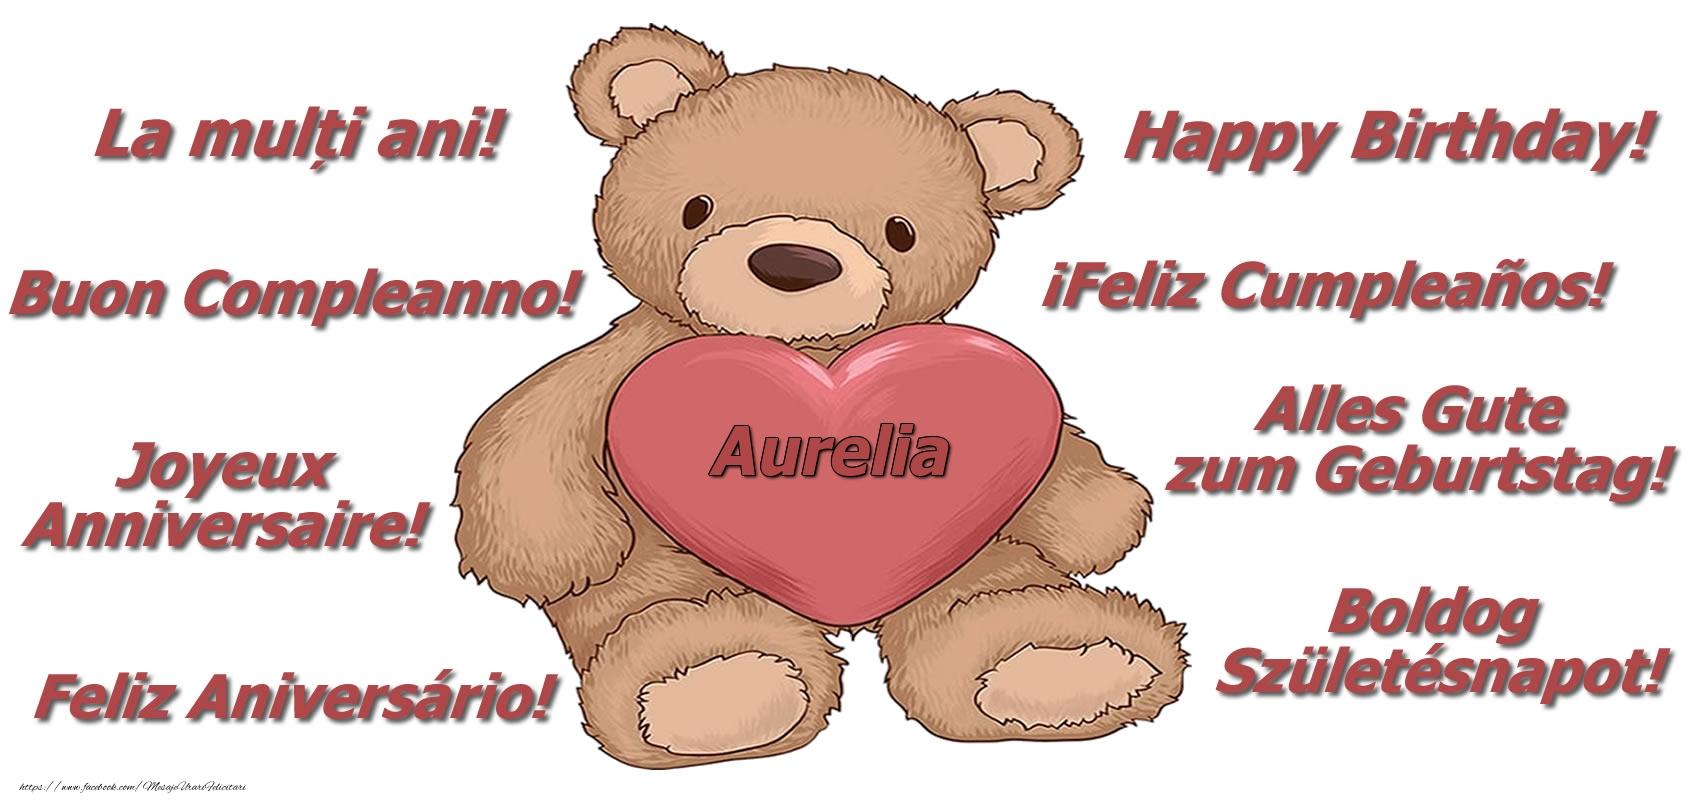 Felicitari de zi de nastere - La multi ani Aurelia! - Ursulet